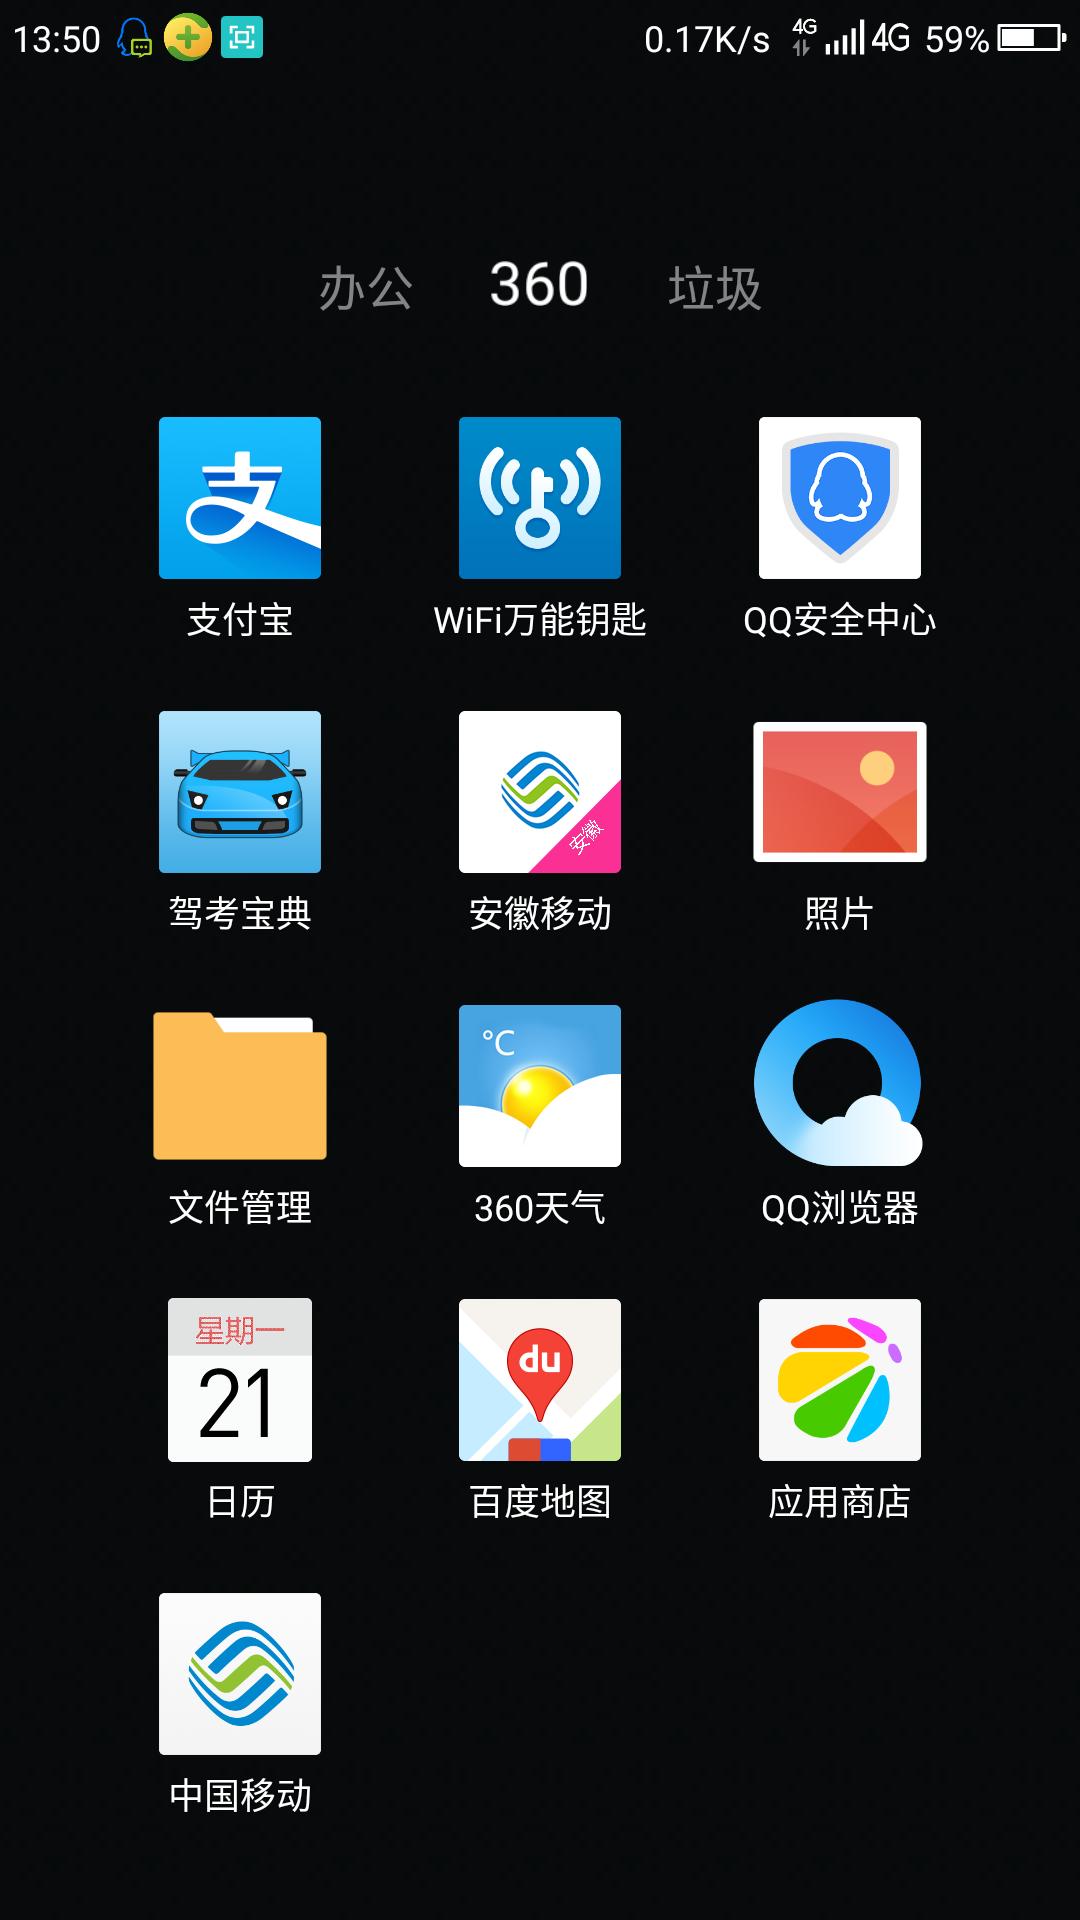 Screenshot_2017-08-21-13-50-44.png